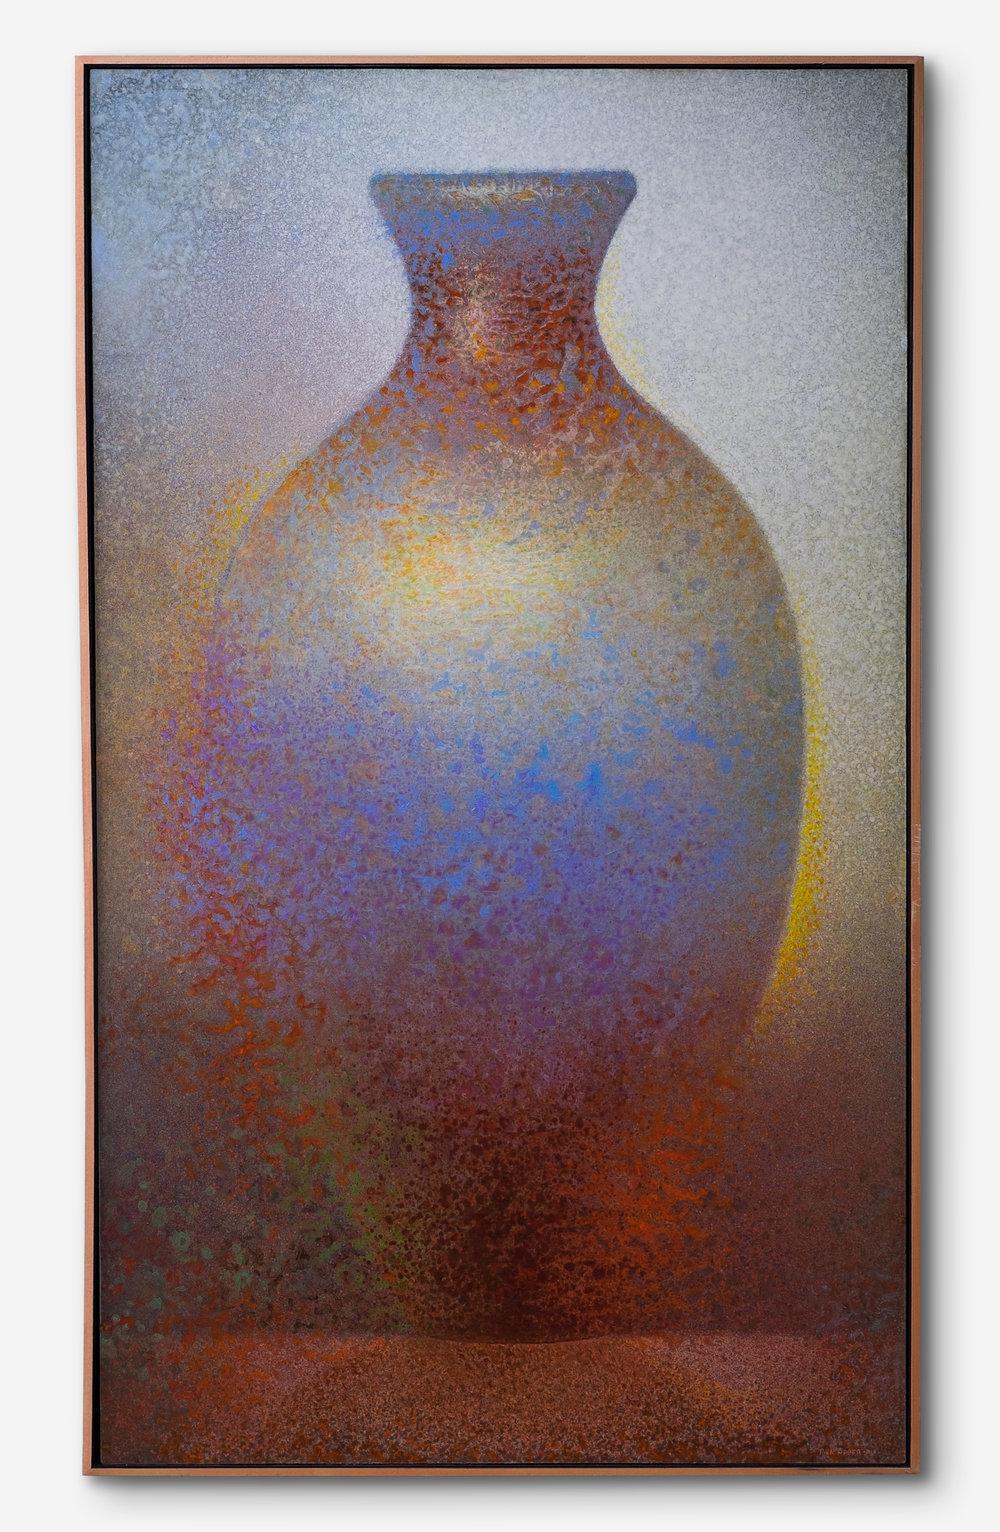 Earth Vase #17